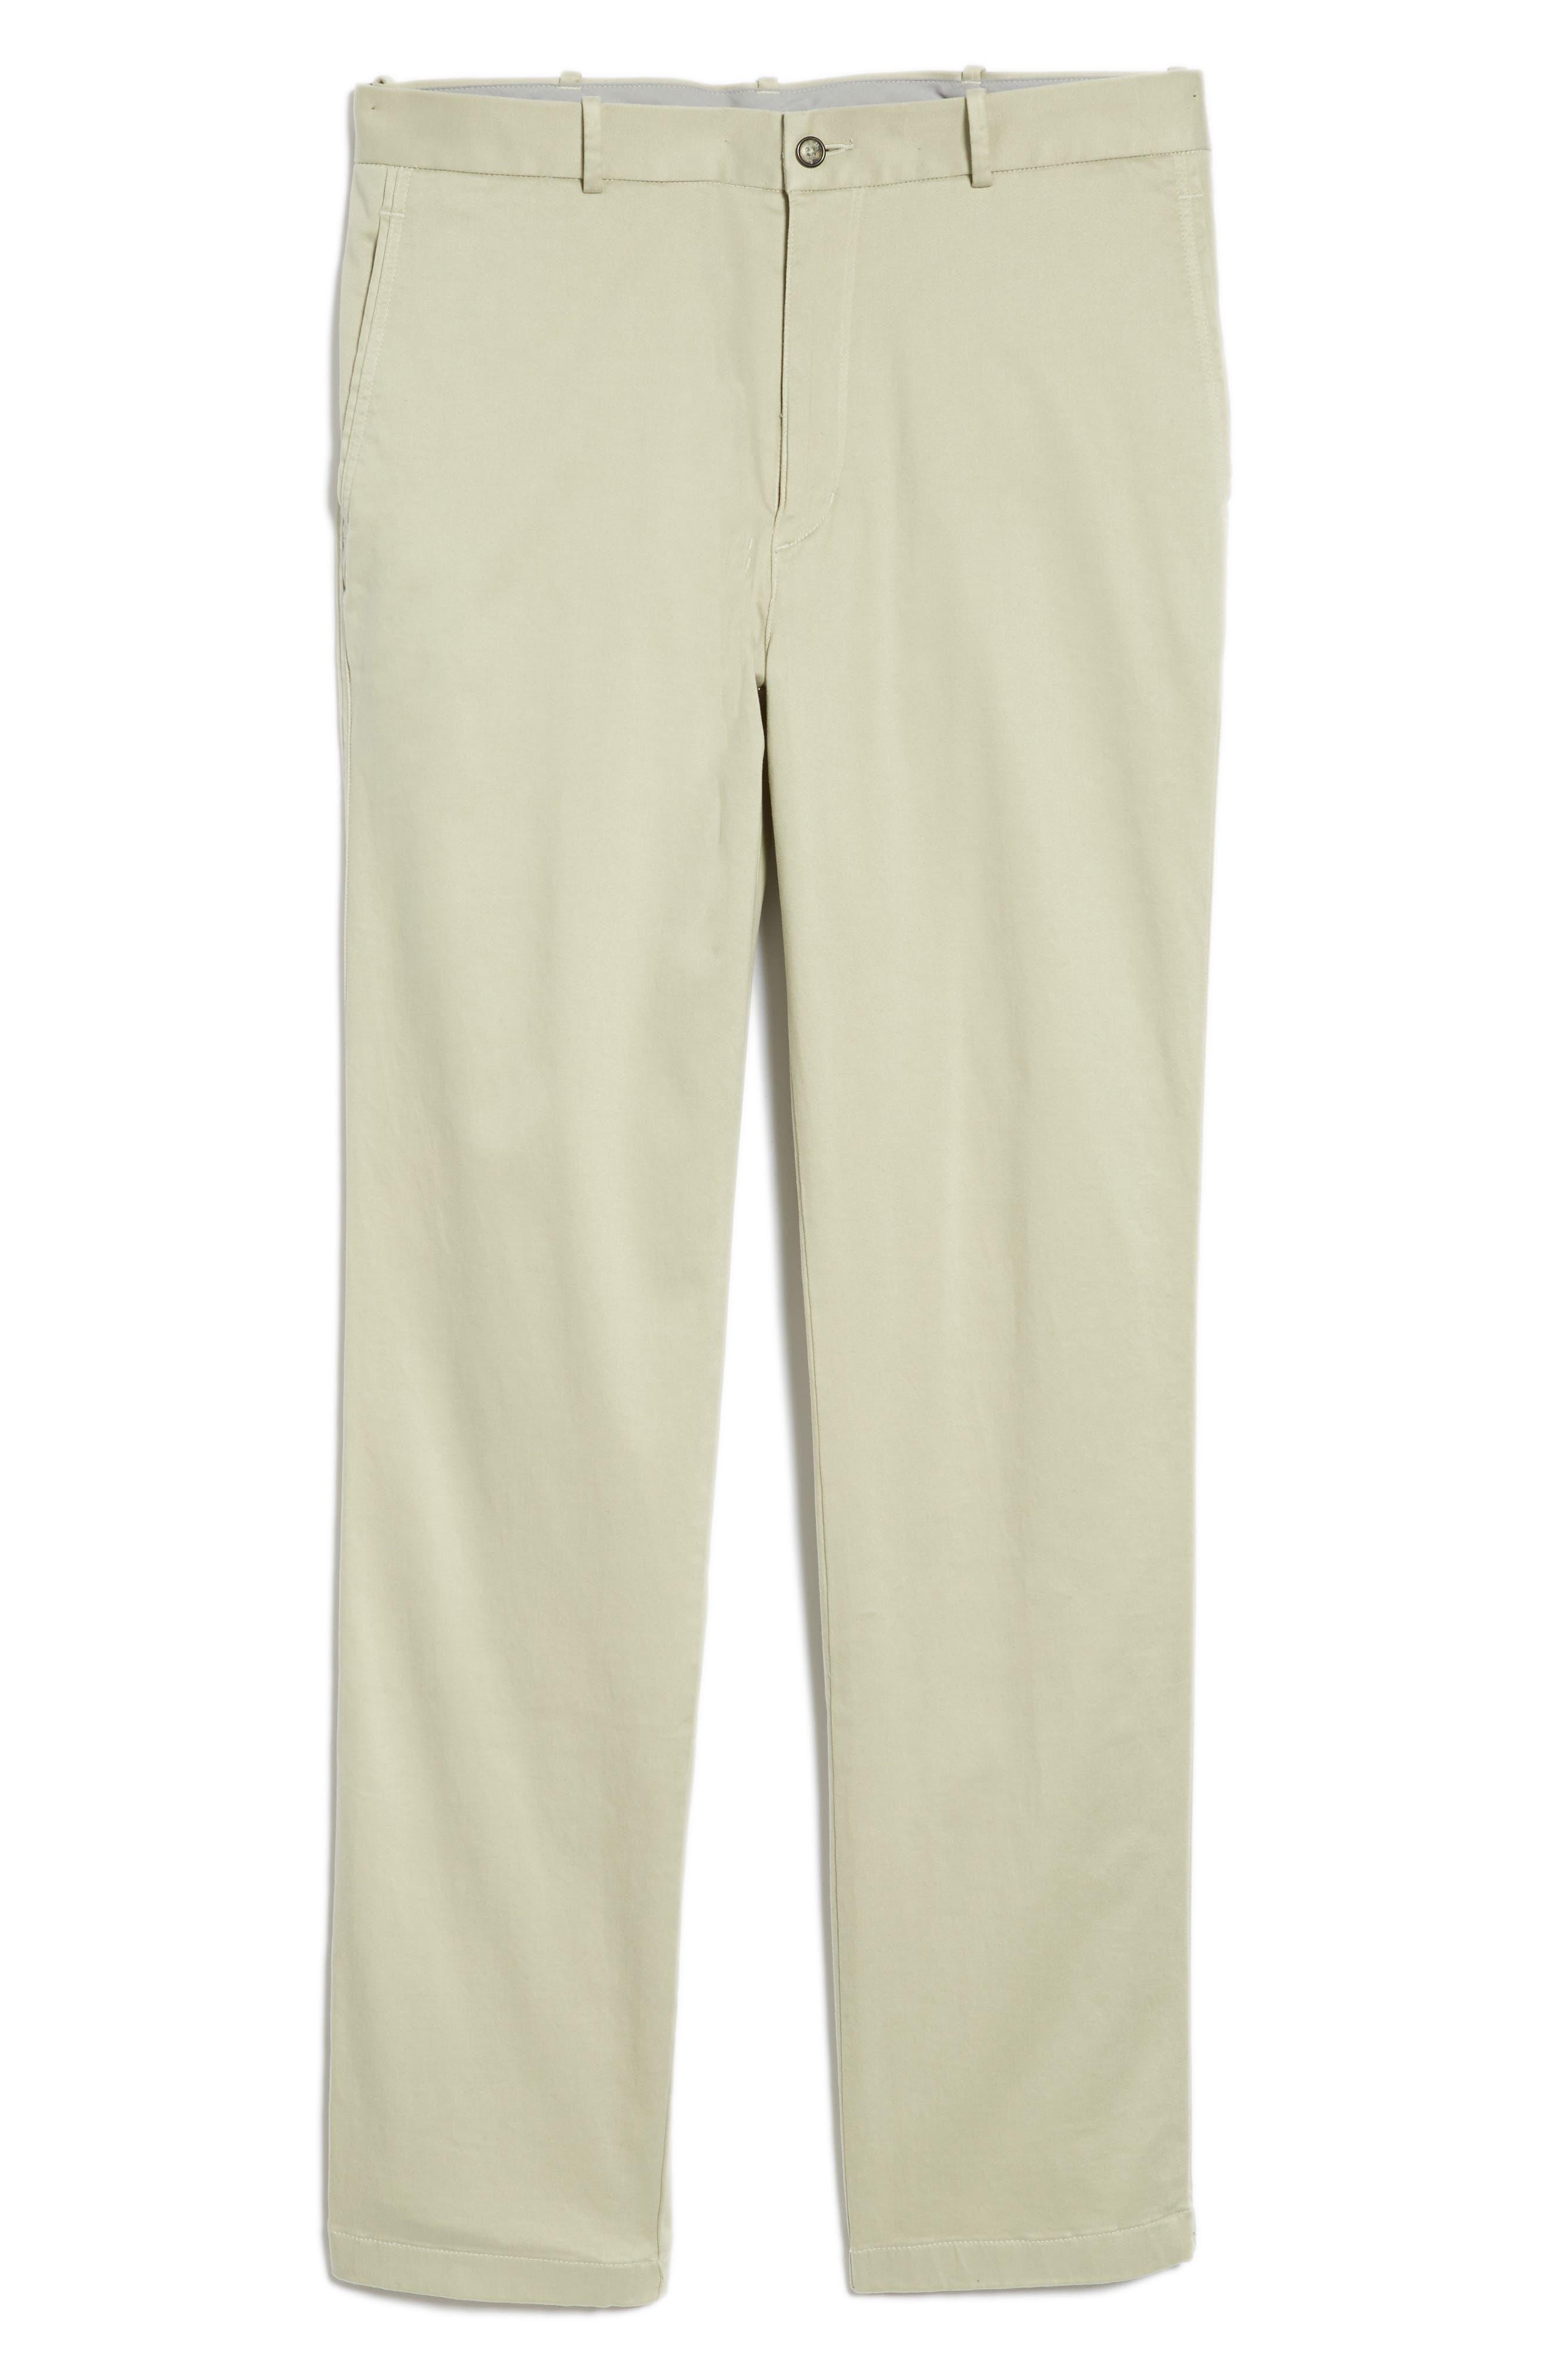 St. Charles Brushed Chino Pants,                             Alternate thumbnail 6, color,                             051